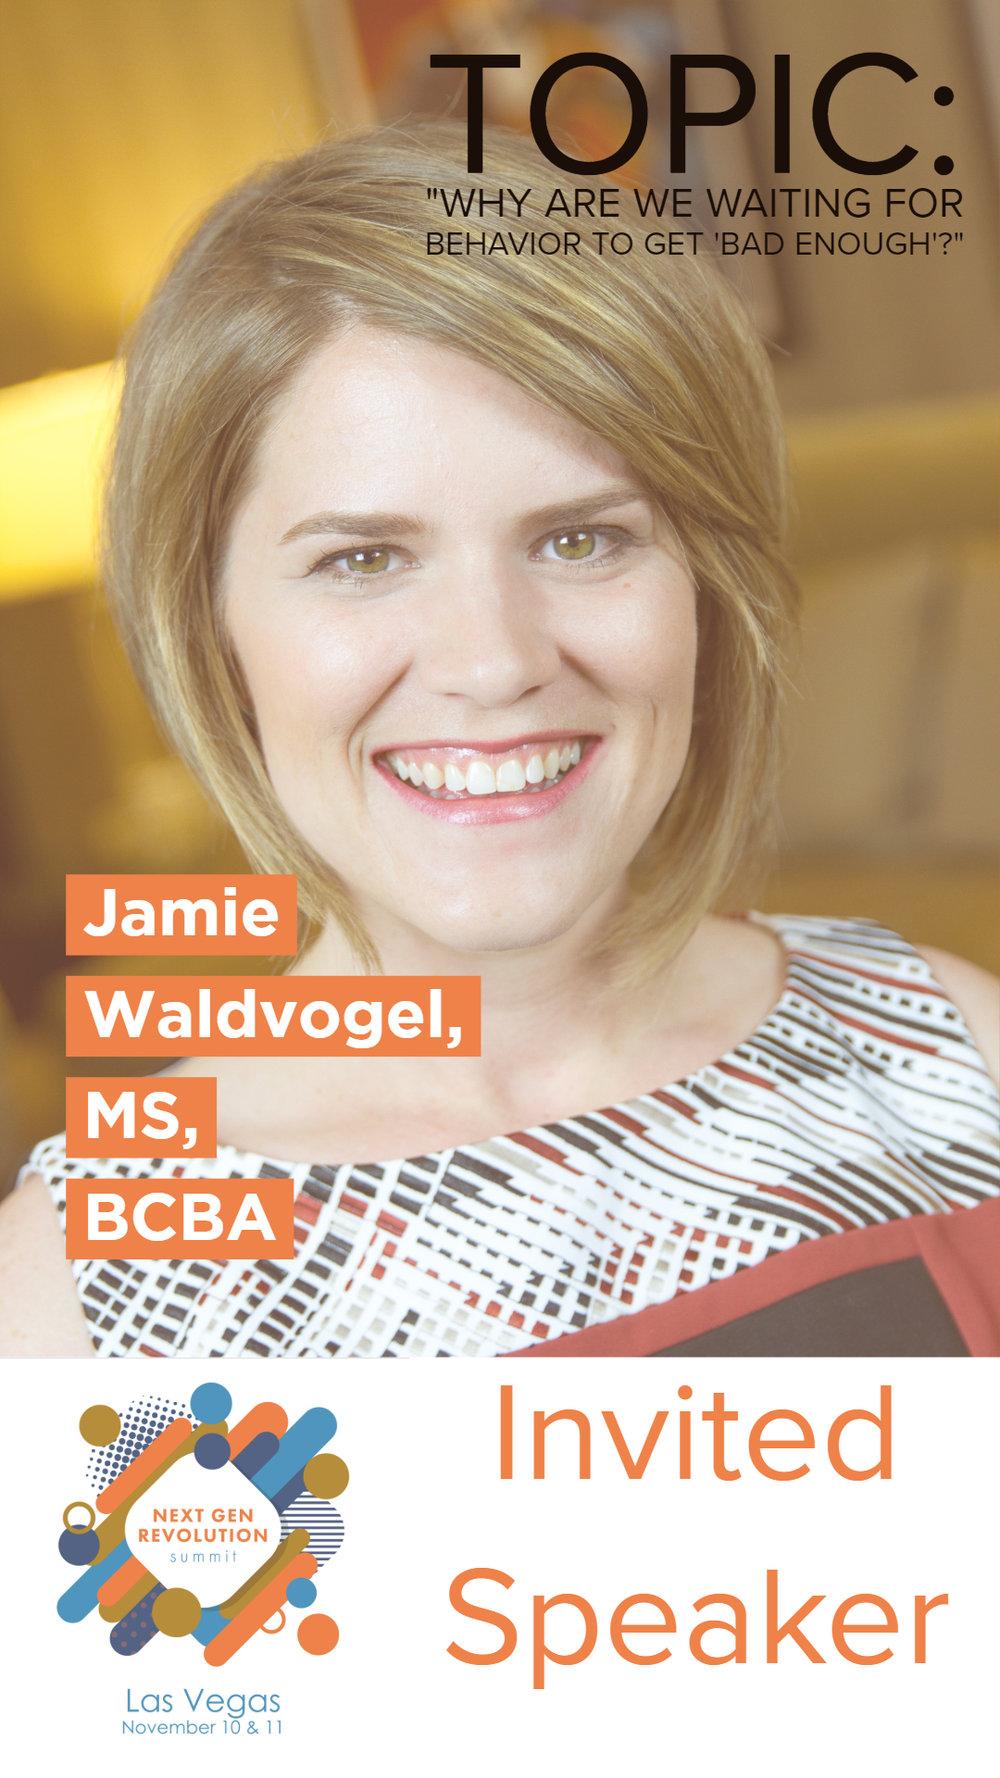 Jamie Waldvogel, MS, BCBA